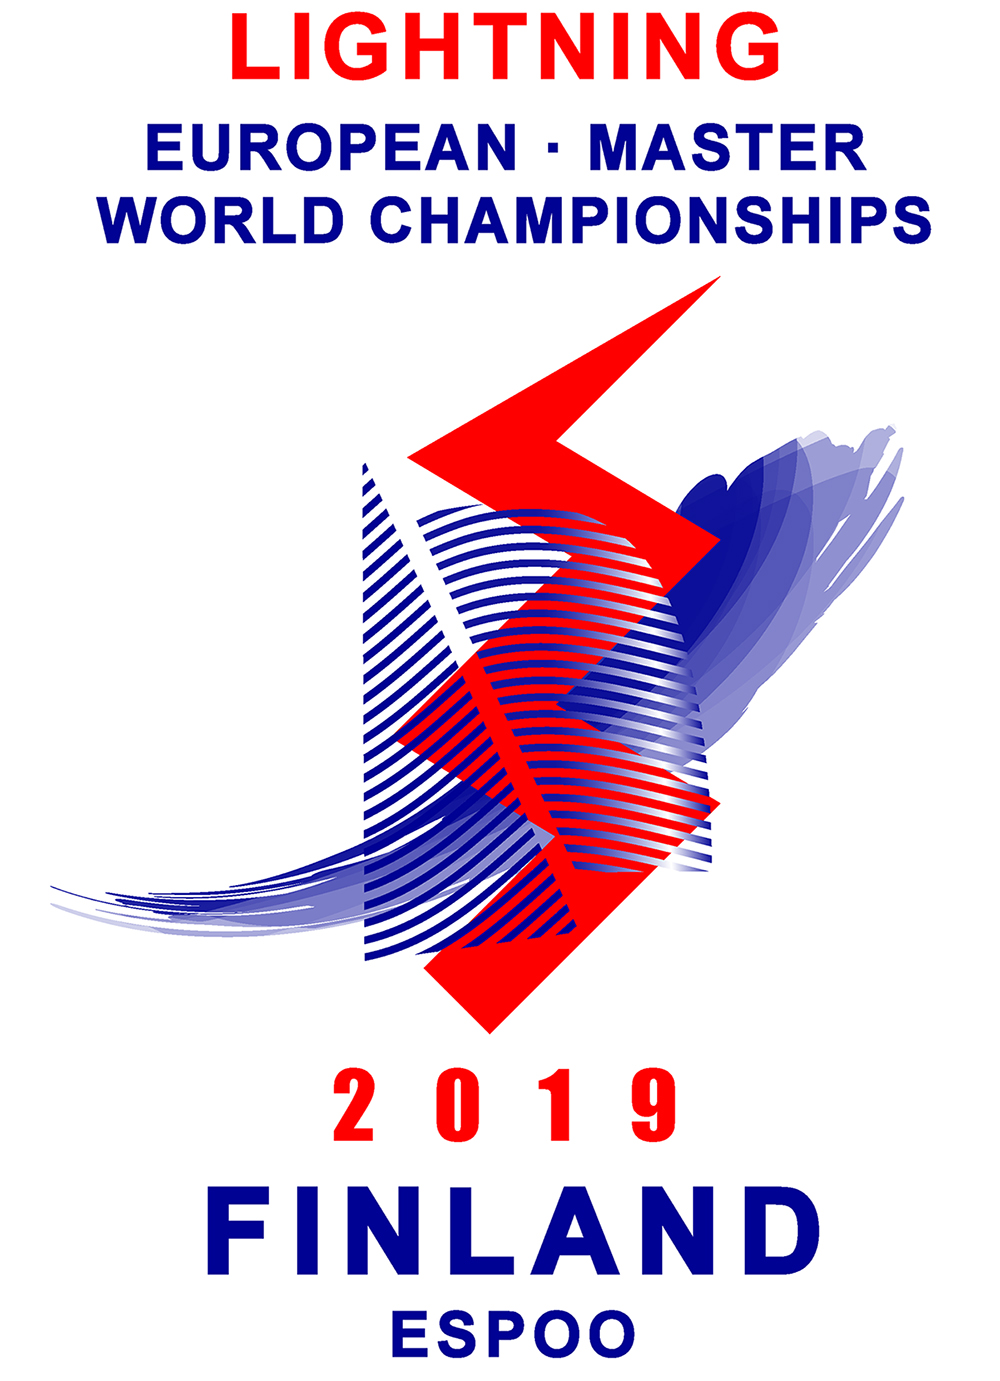 Lightning Worlds2019 logo by Veera Siira 1380px version.jpg